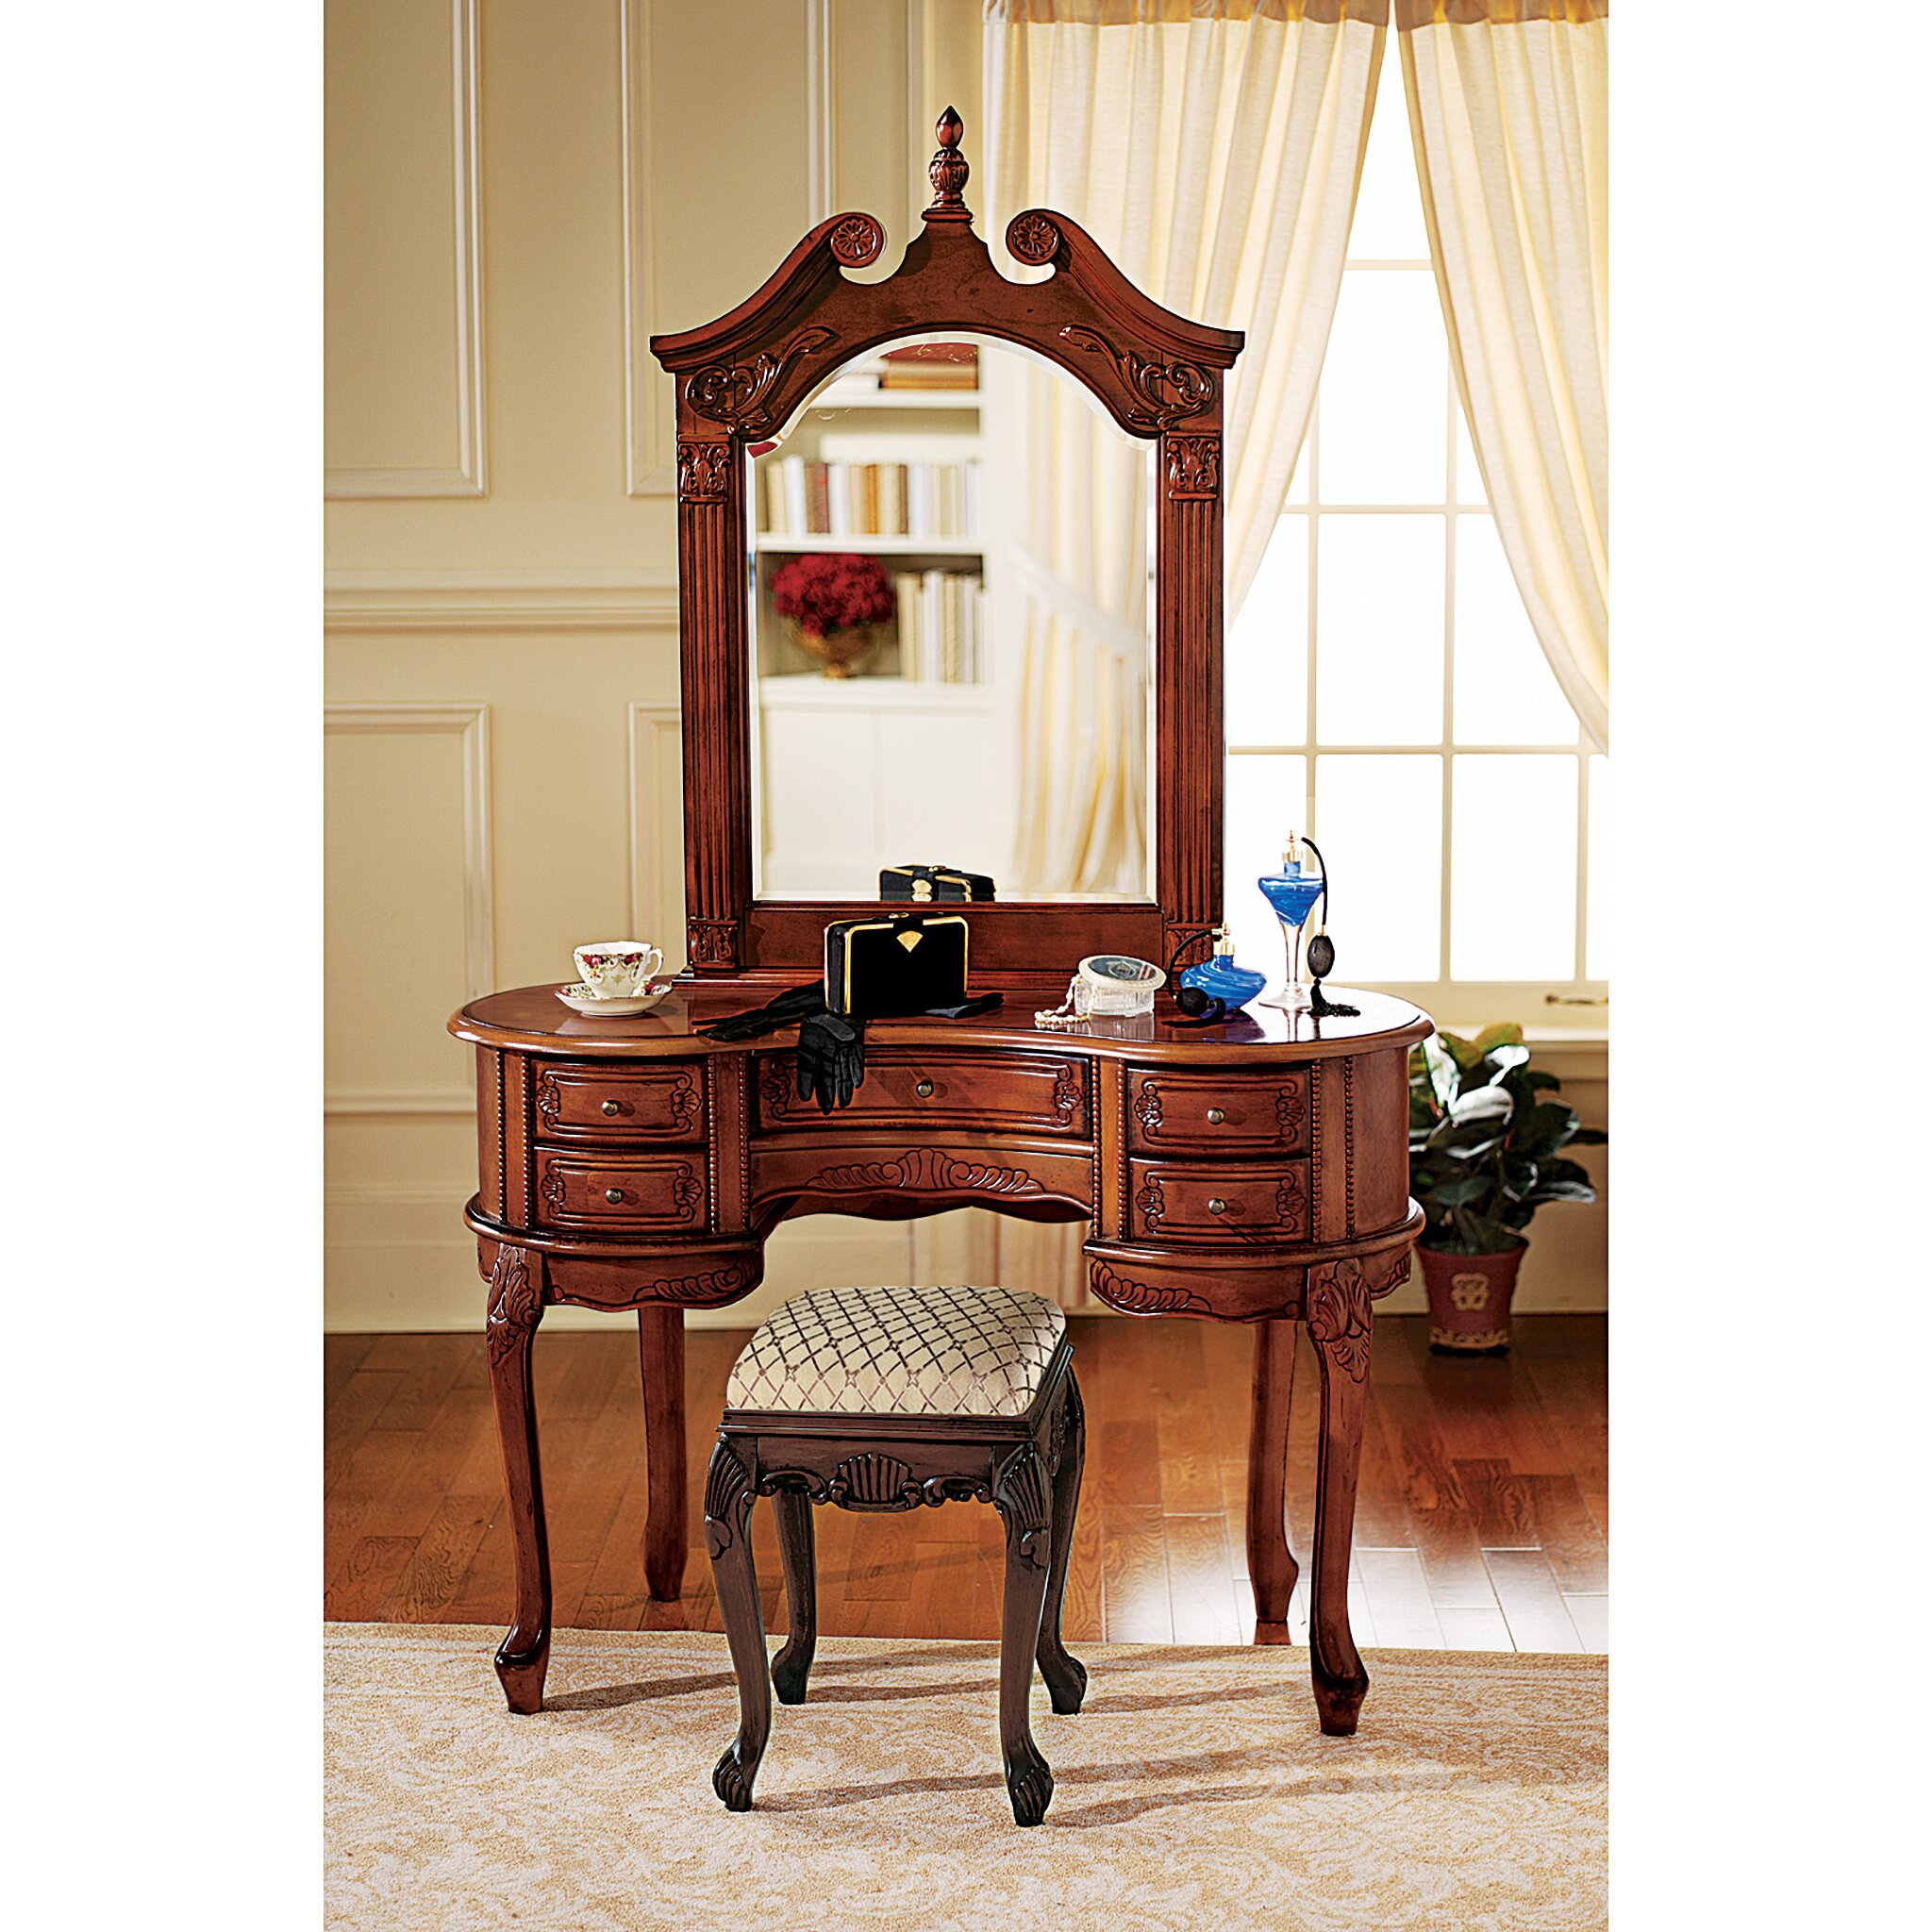 Design Toscano Queen Anne Vanity With Mirror Reviews